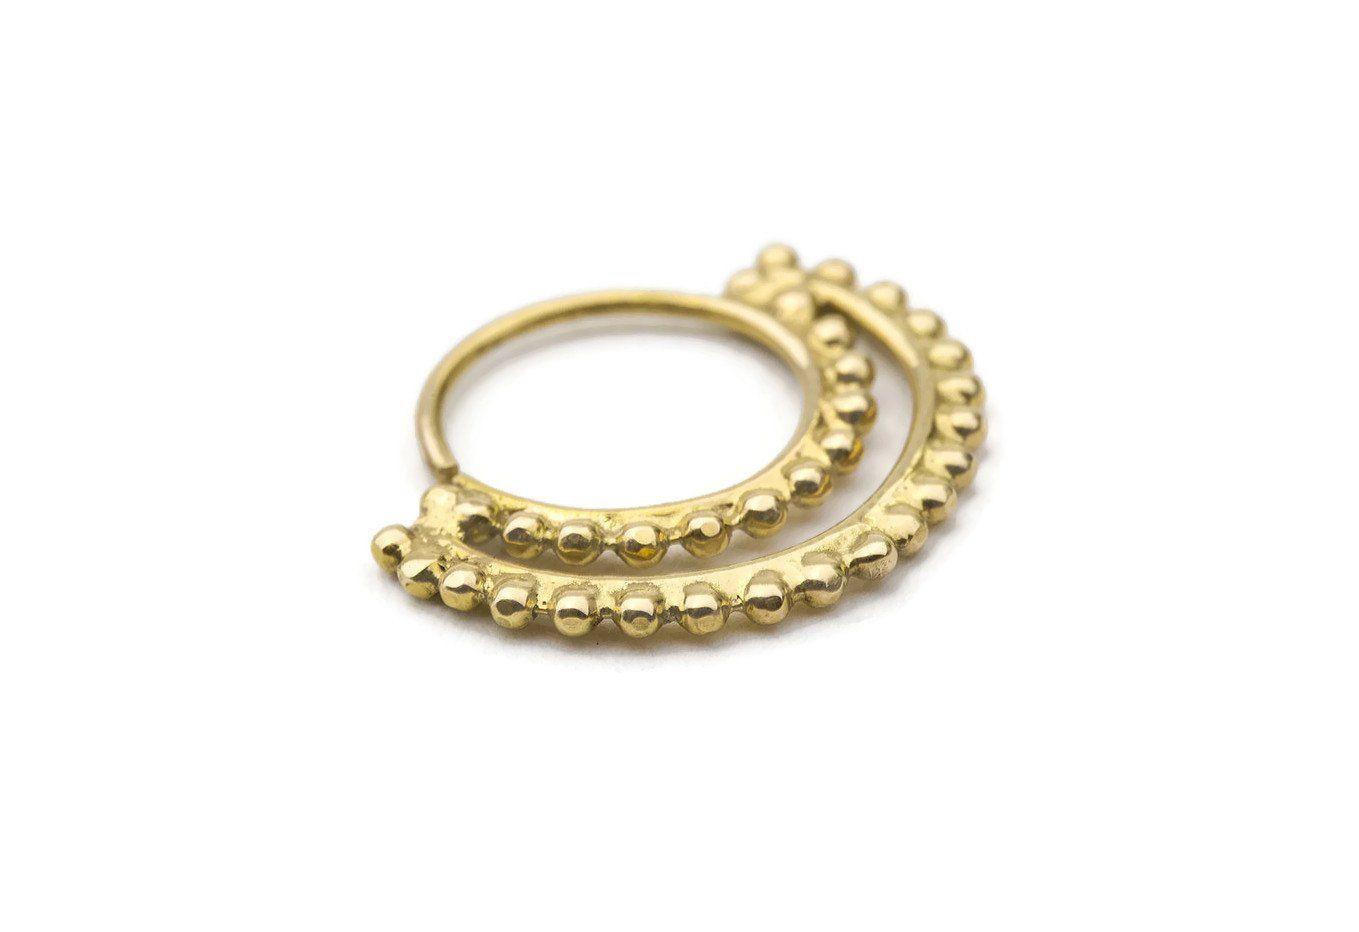 Gold nose piercing  Studio Meme Designer Handmade Nose Rings available in Solid k